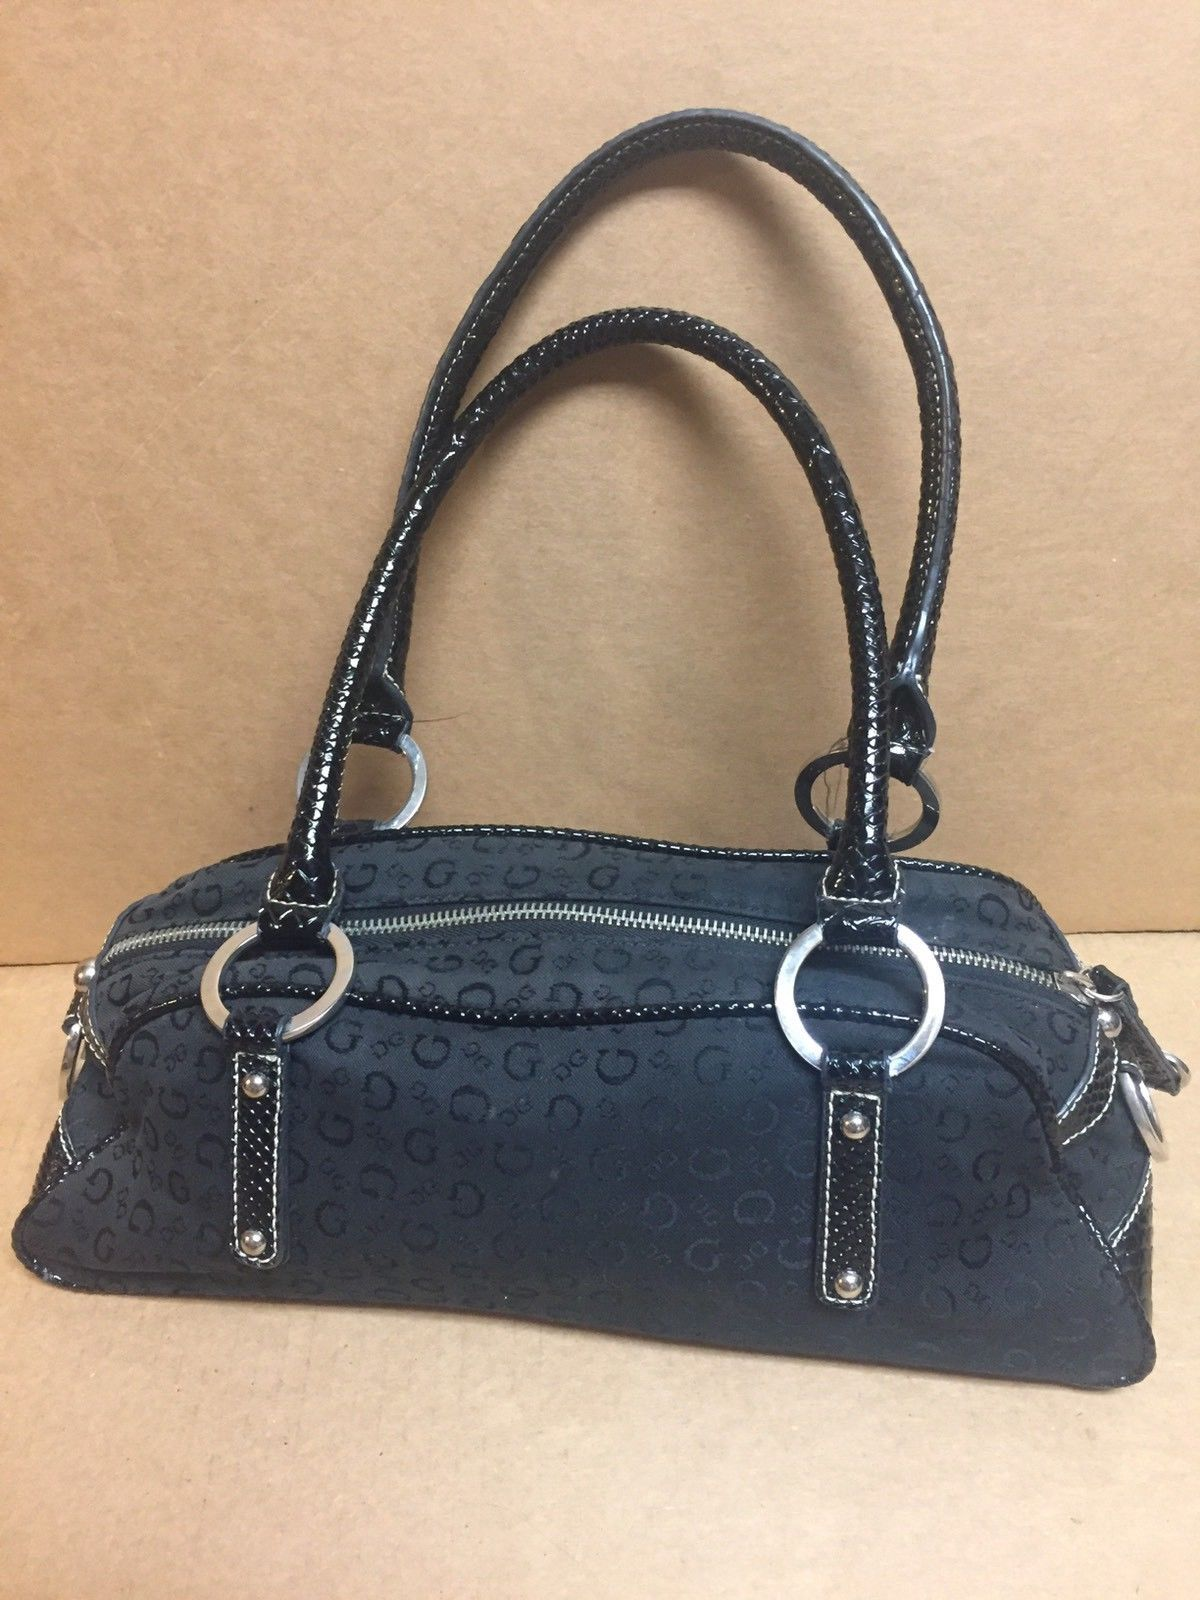 Sassy Black Guess Canvas Patent Leather Monogram Purse Handbag Nice 14 99